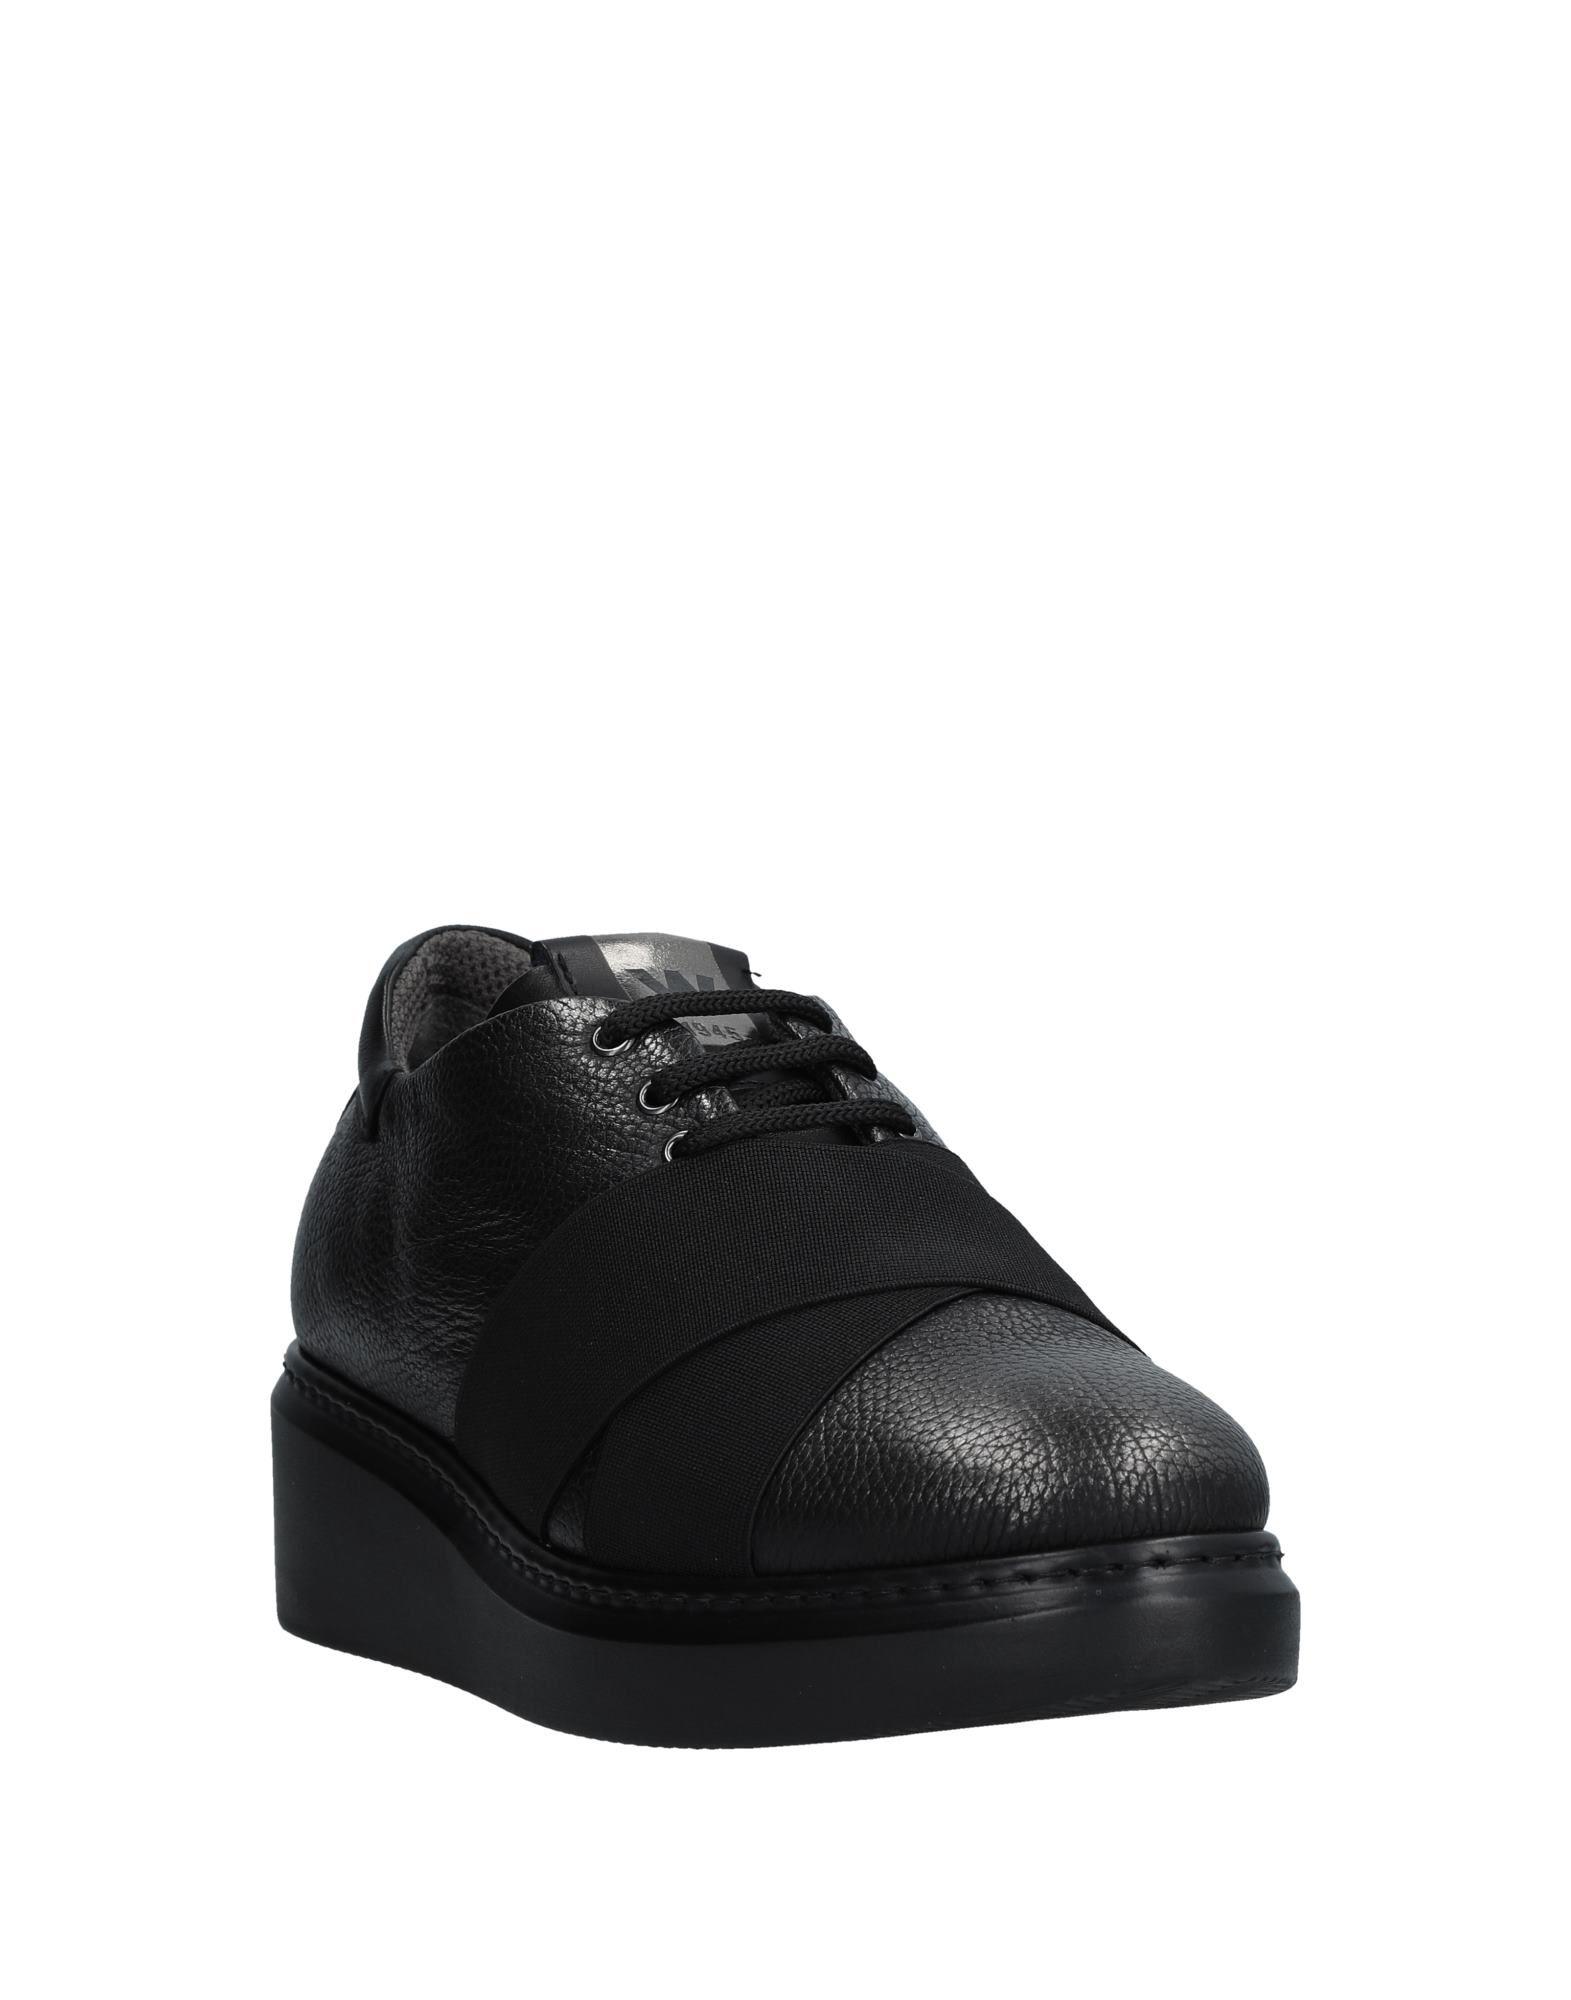 Walk By Melluso Sneakers Qualität Damen  11535060BK Gute Qualität Sneakers beliebte Schuhe ef83bf